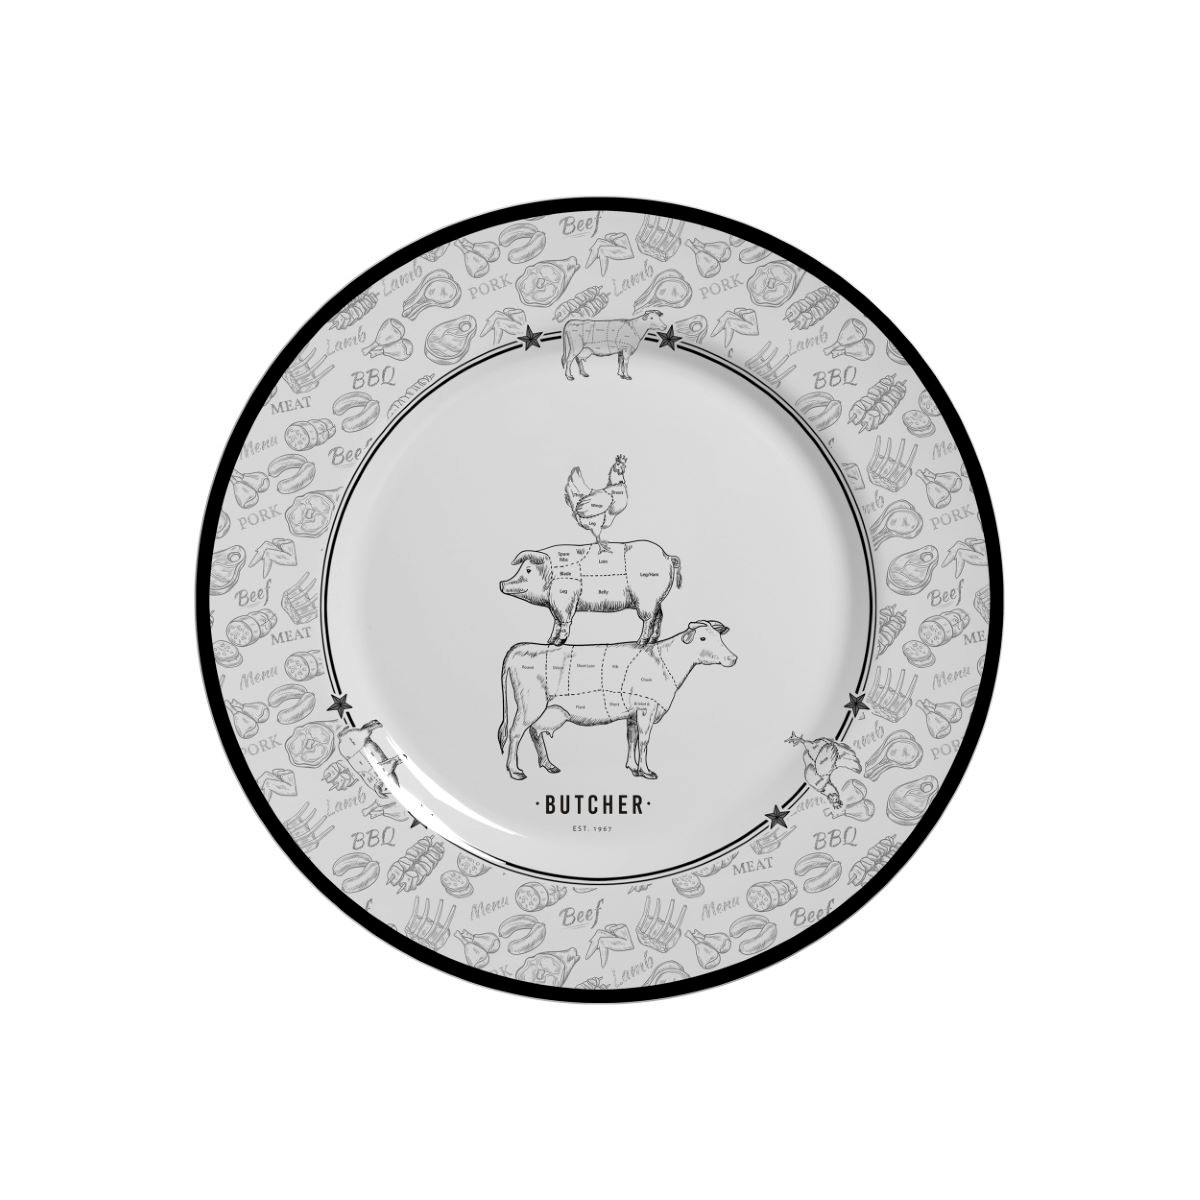 Prato Sobremesa Barbecue Cerâmica Alleanza - 6 Peças